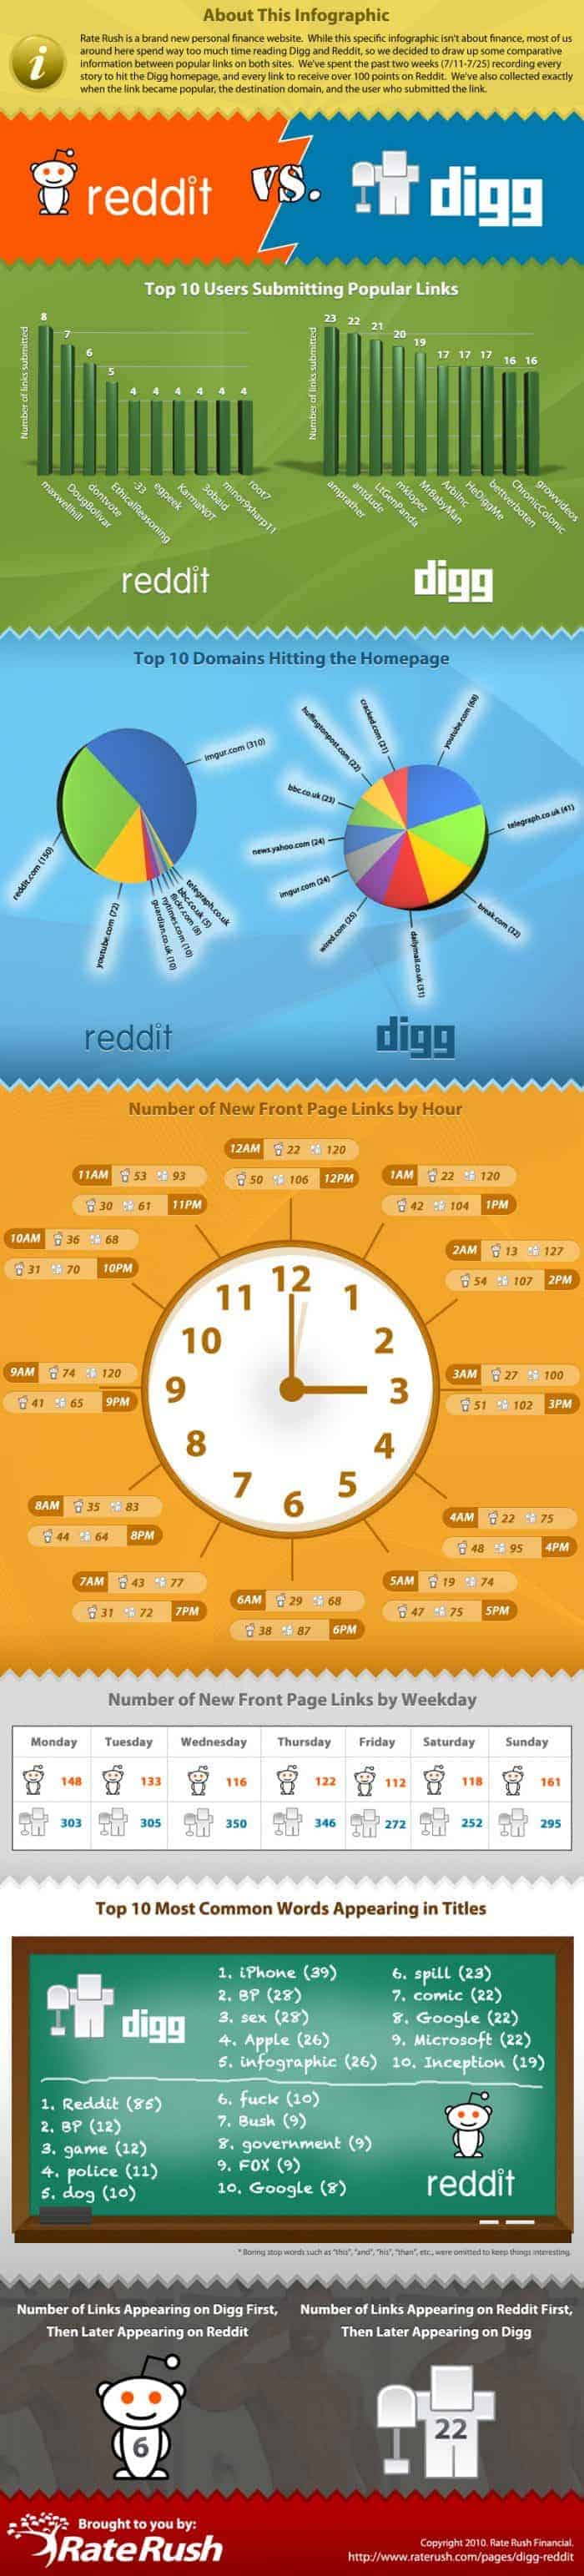 Reddit vs Digg comparison